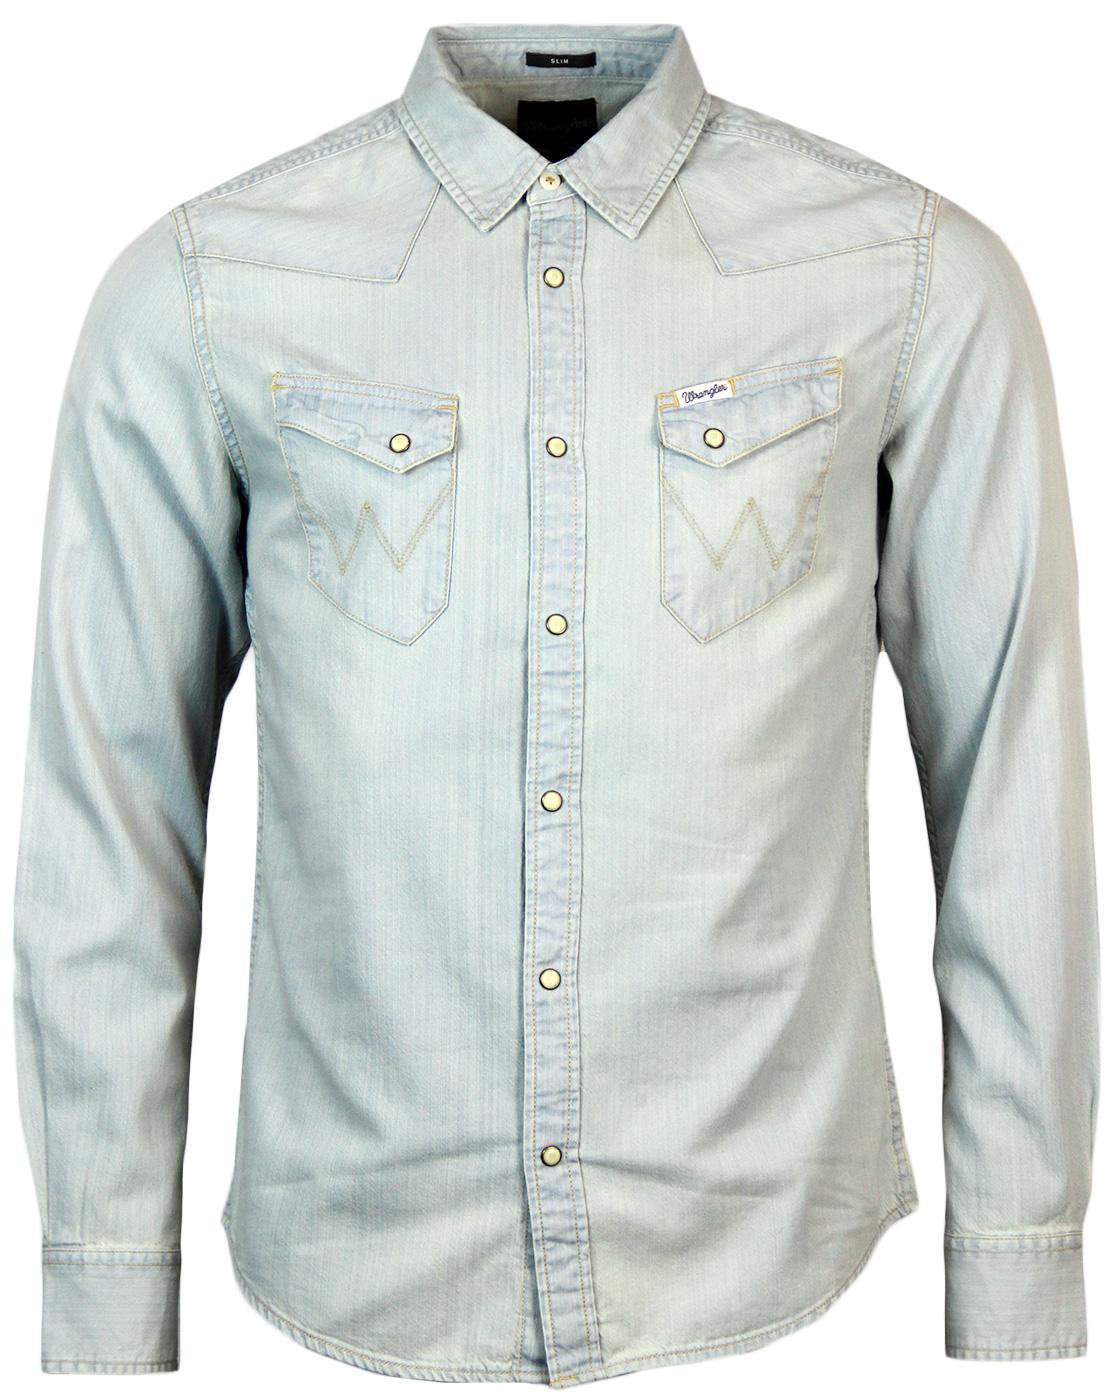 Wrangler city western retro seventies denim shirt in super for Wrangler denim shirts uk